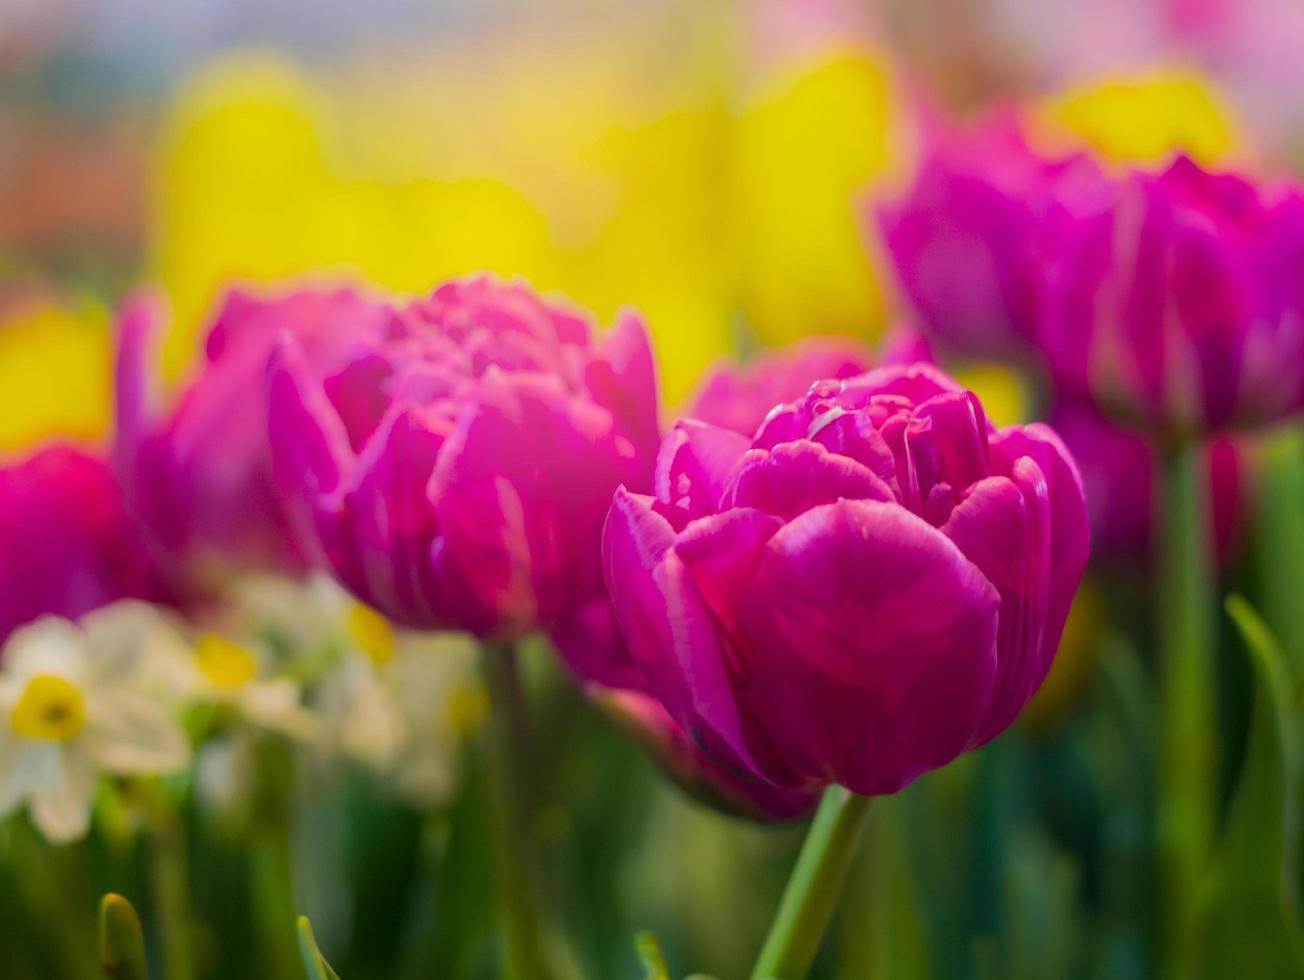 tulpen bloeien in de tuin foto